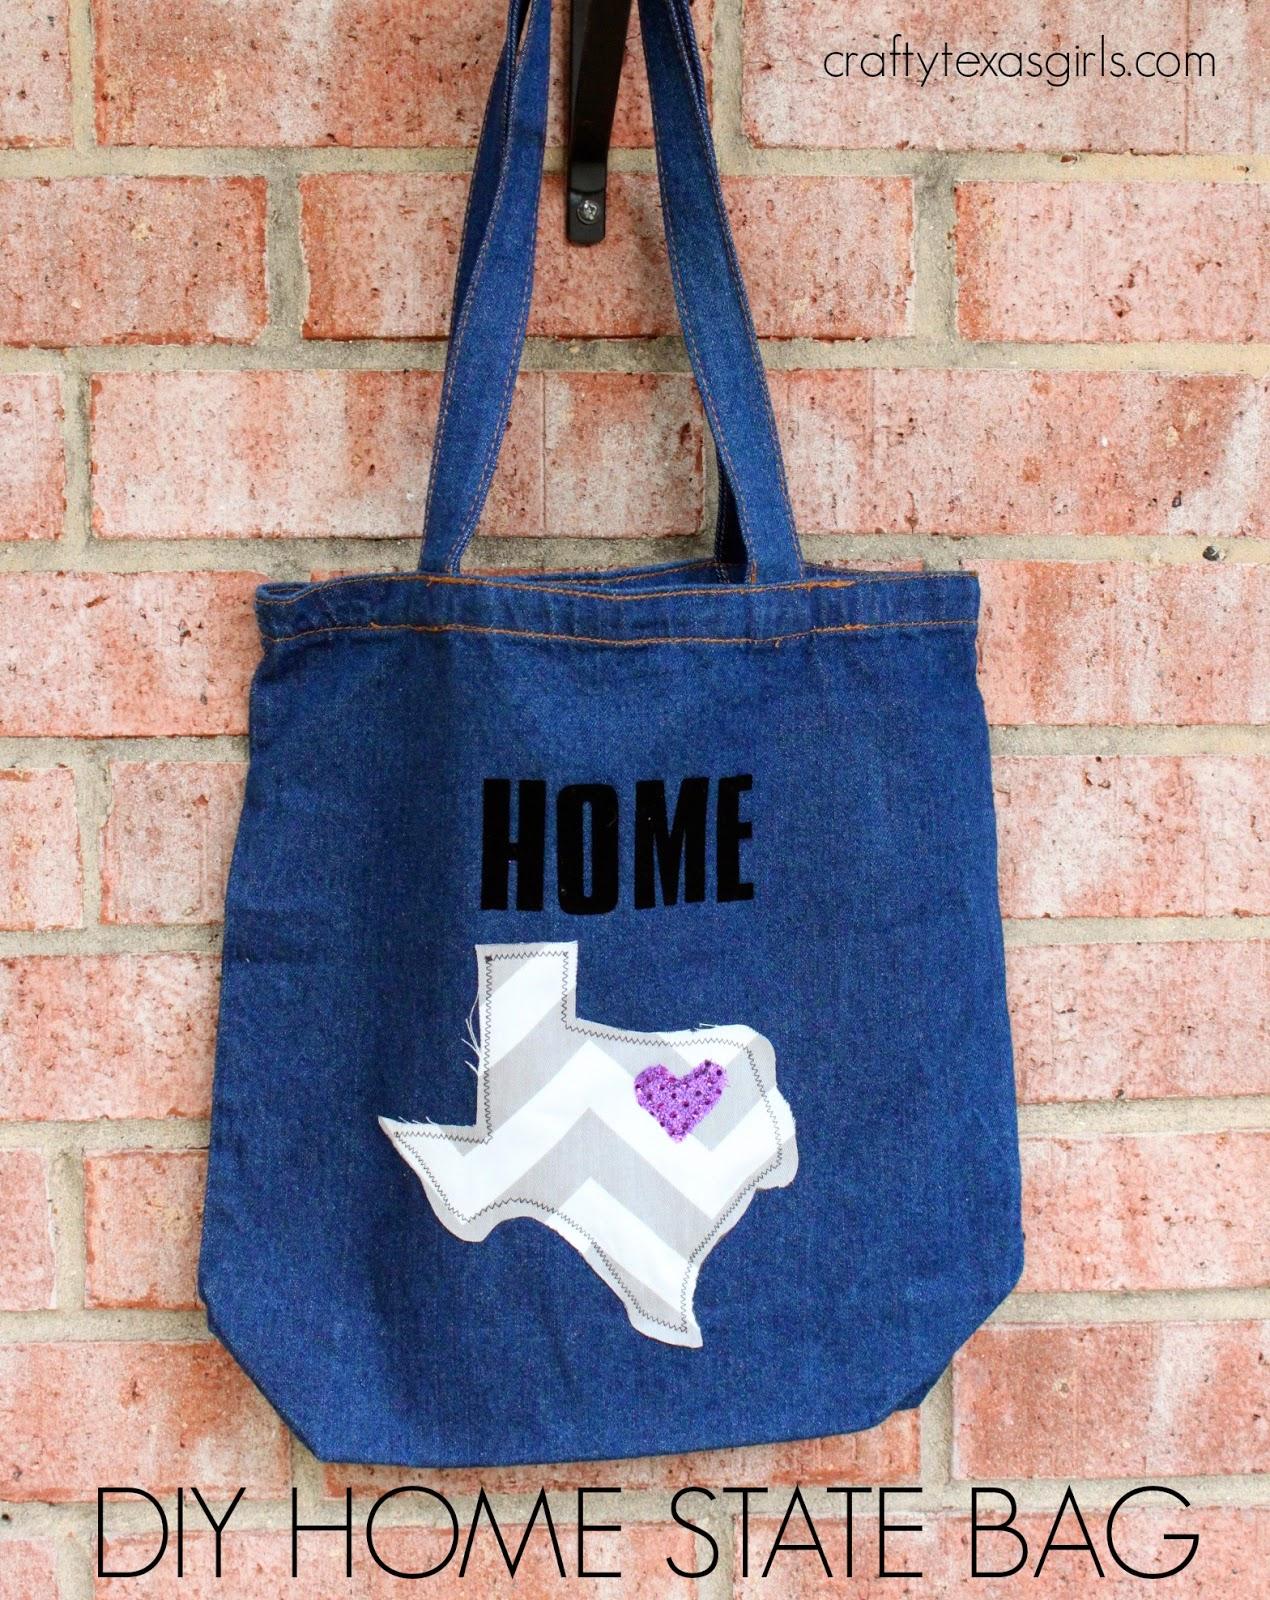 uniforms school diy tote bags little girls. Black Bedroom Furniture Sets. Home Design Ideas